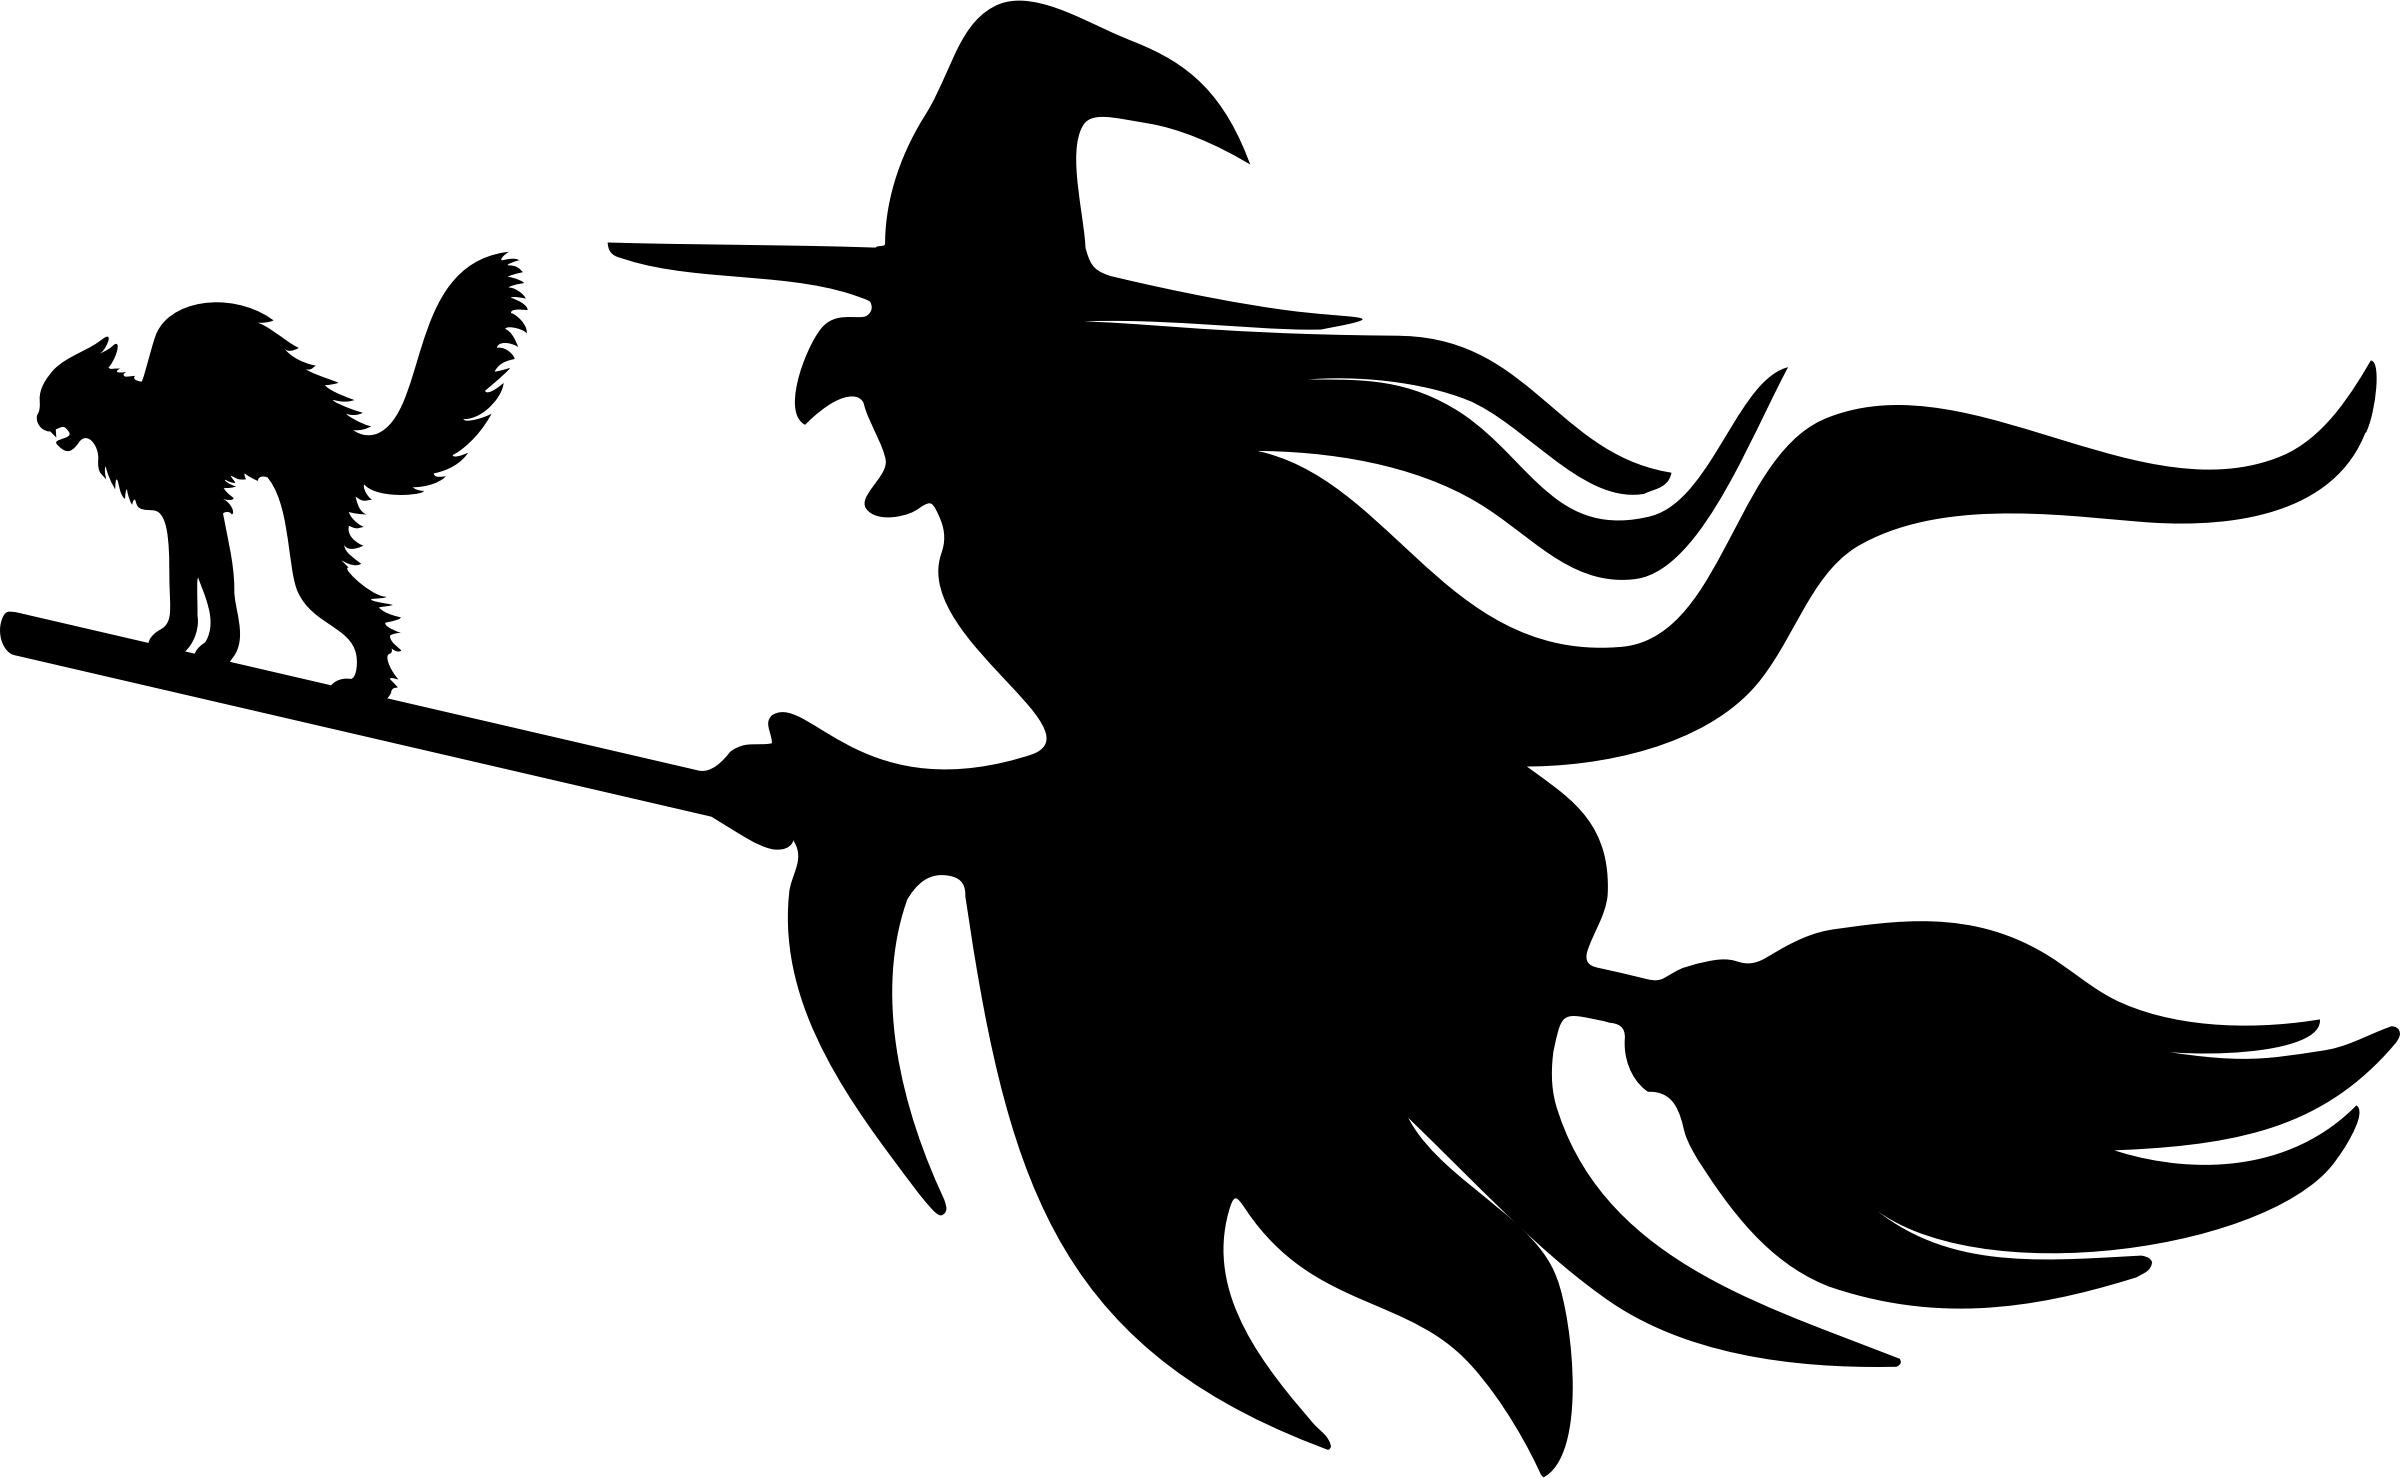 2400x1478 Clipart